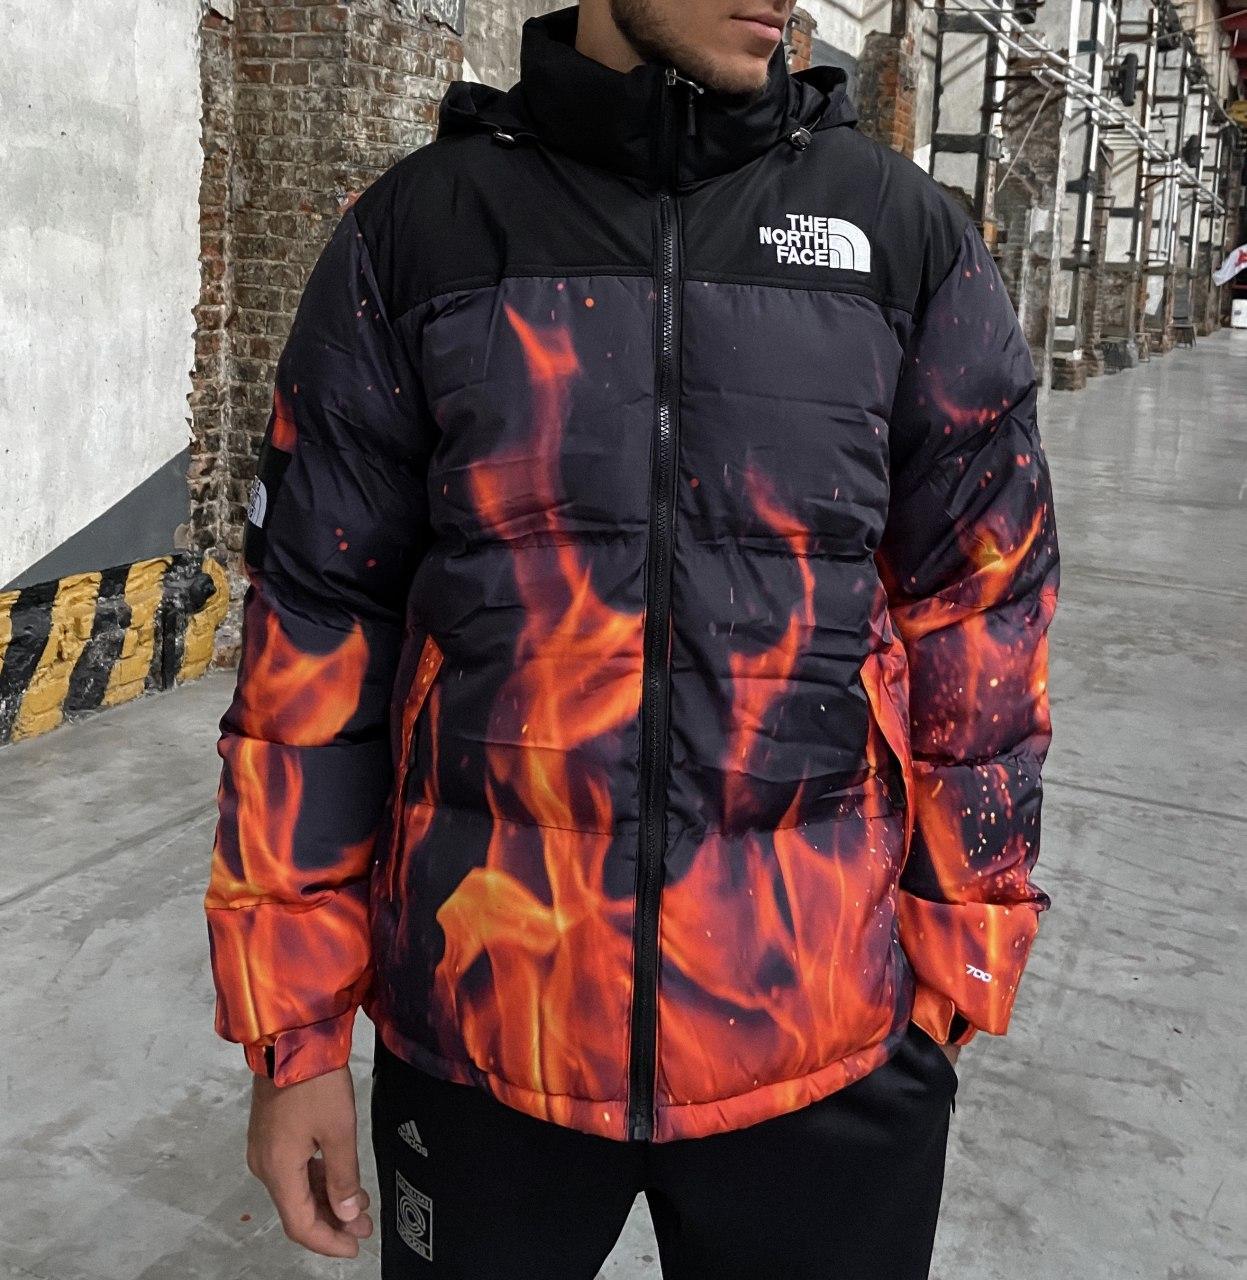 Пуховик - Мужской Пуховик The North Face 700 - Fire